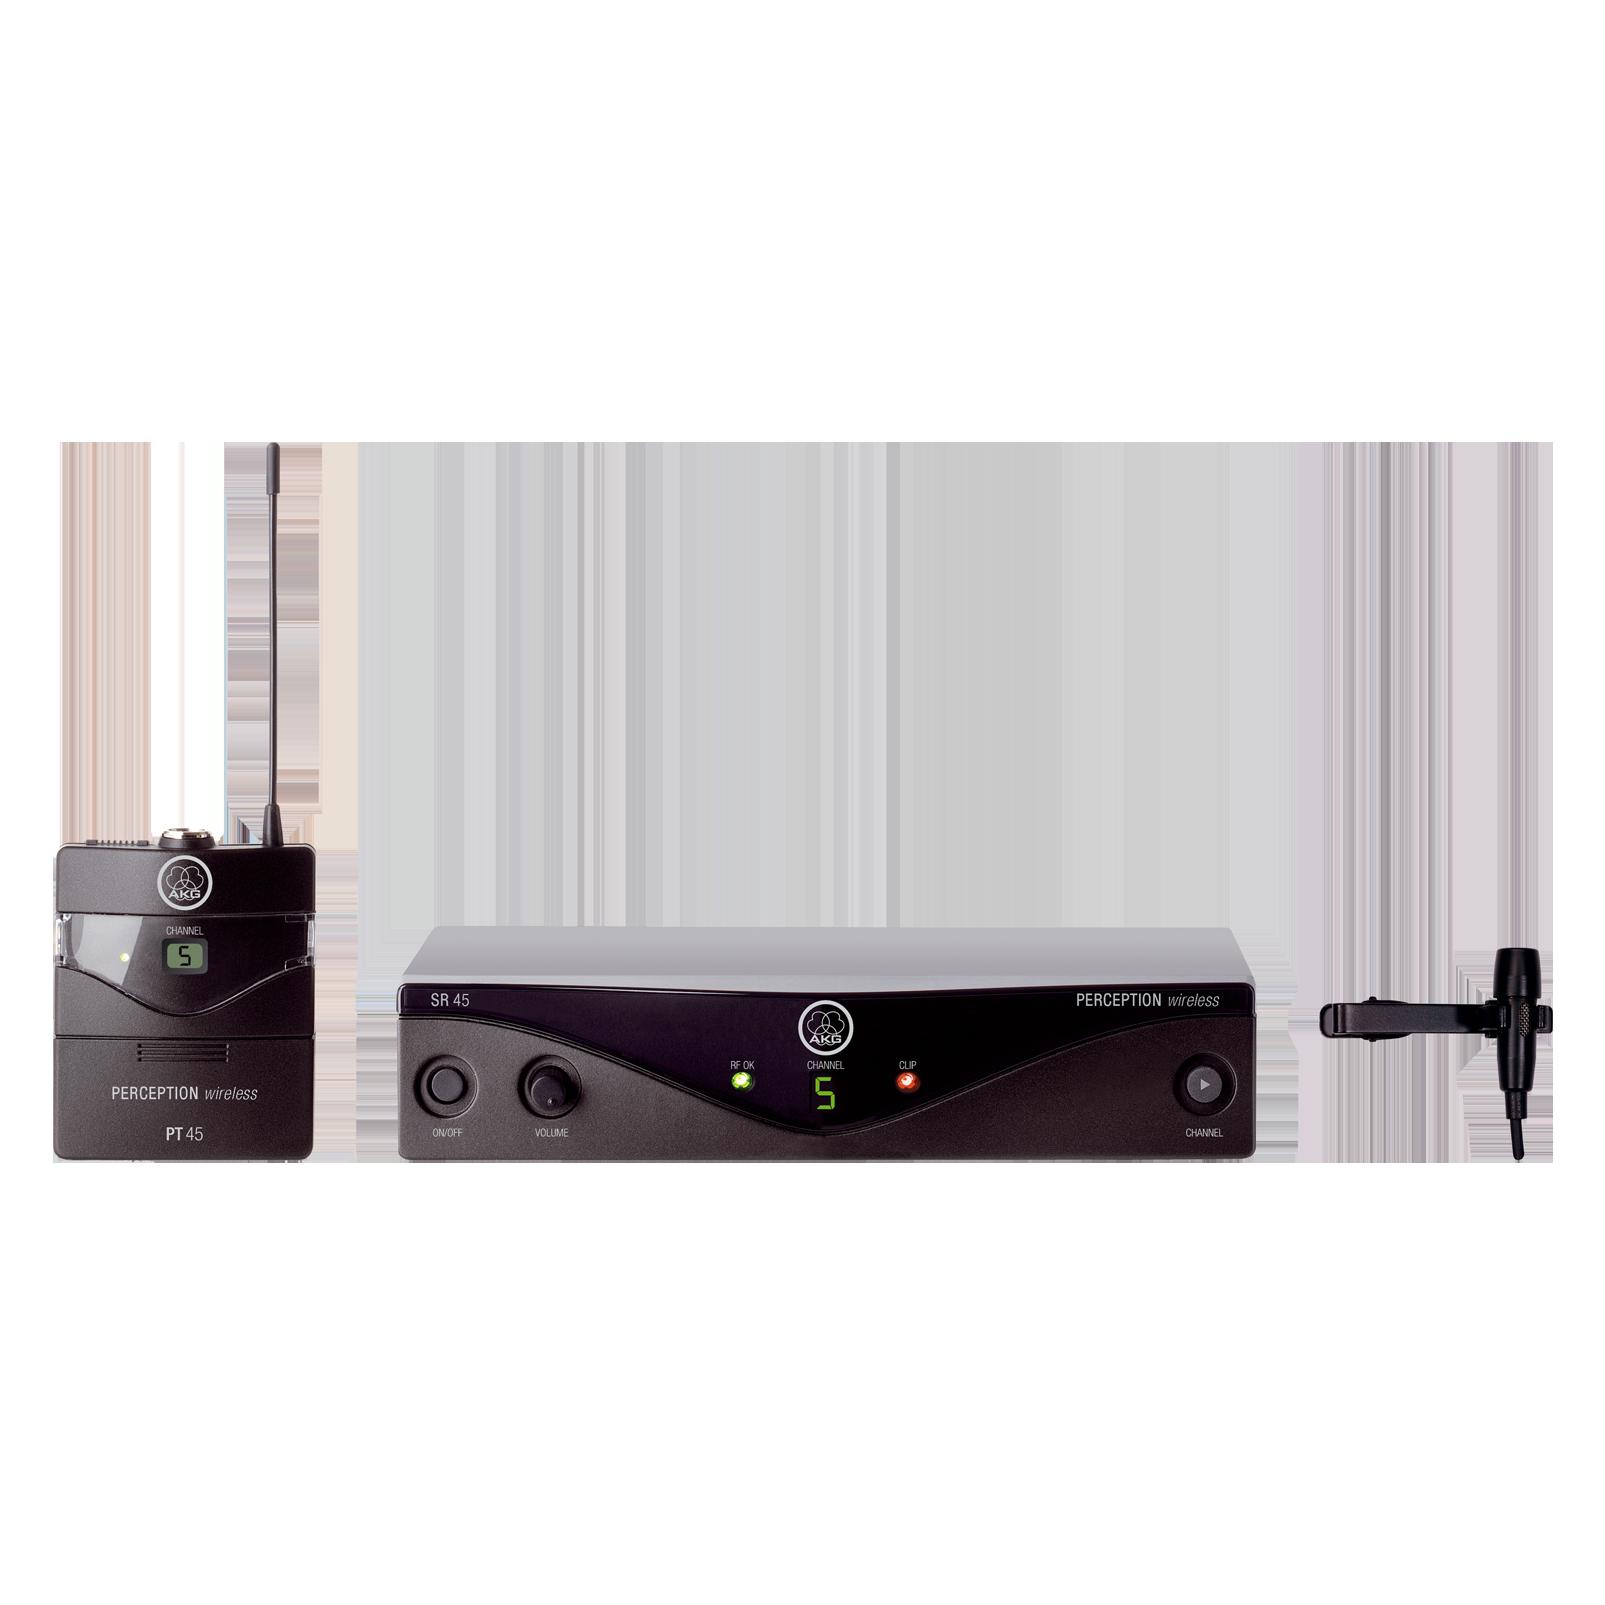 Perception Wireless 45 Presenter Set Band-A - Black - High-performance wireless microphone system - Hero